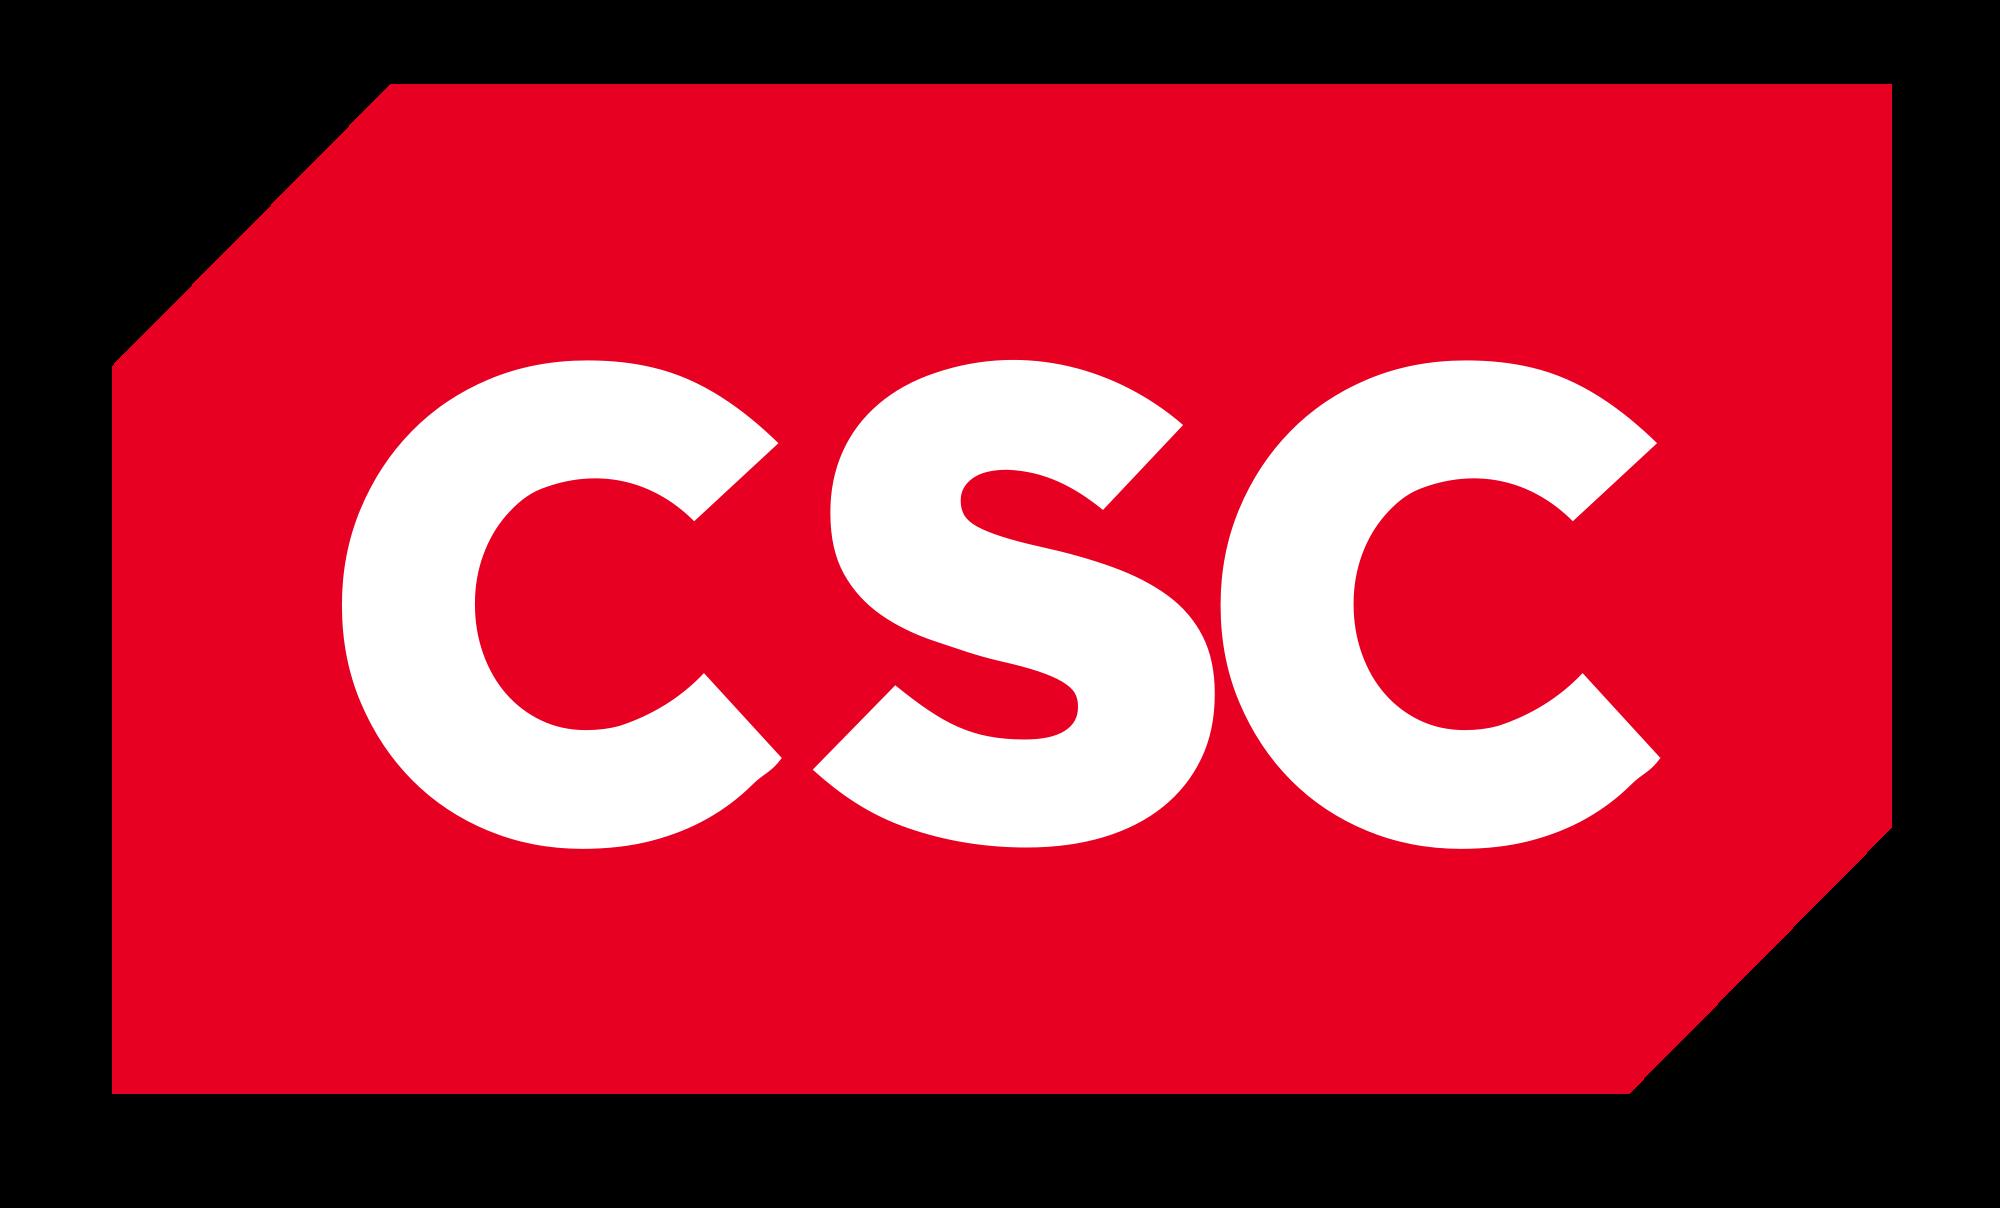 Computer sciences corp csc. Finance clipart business news